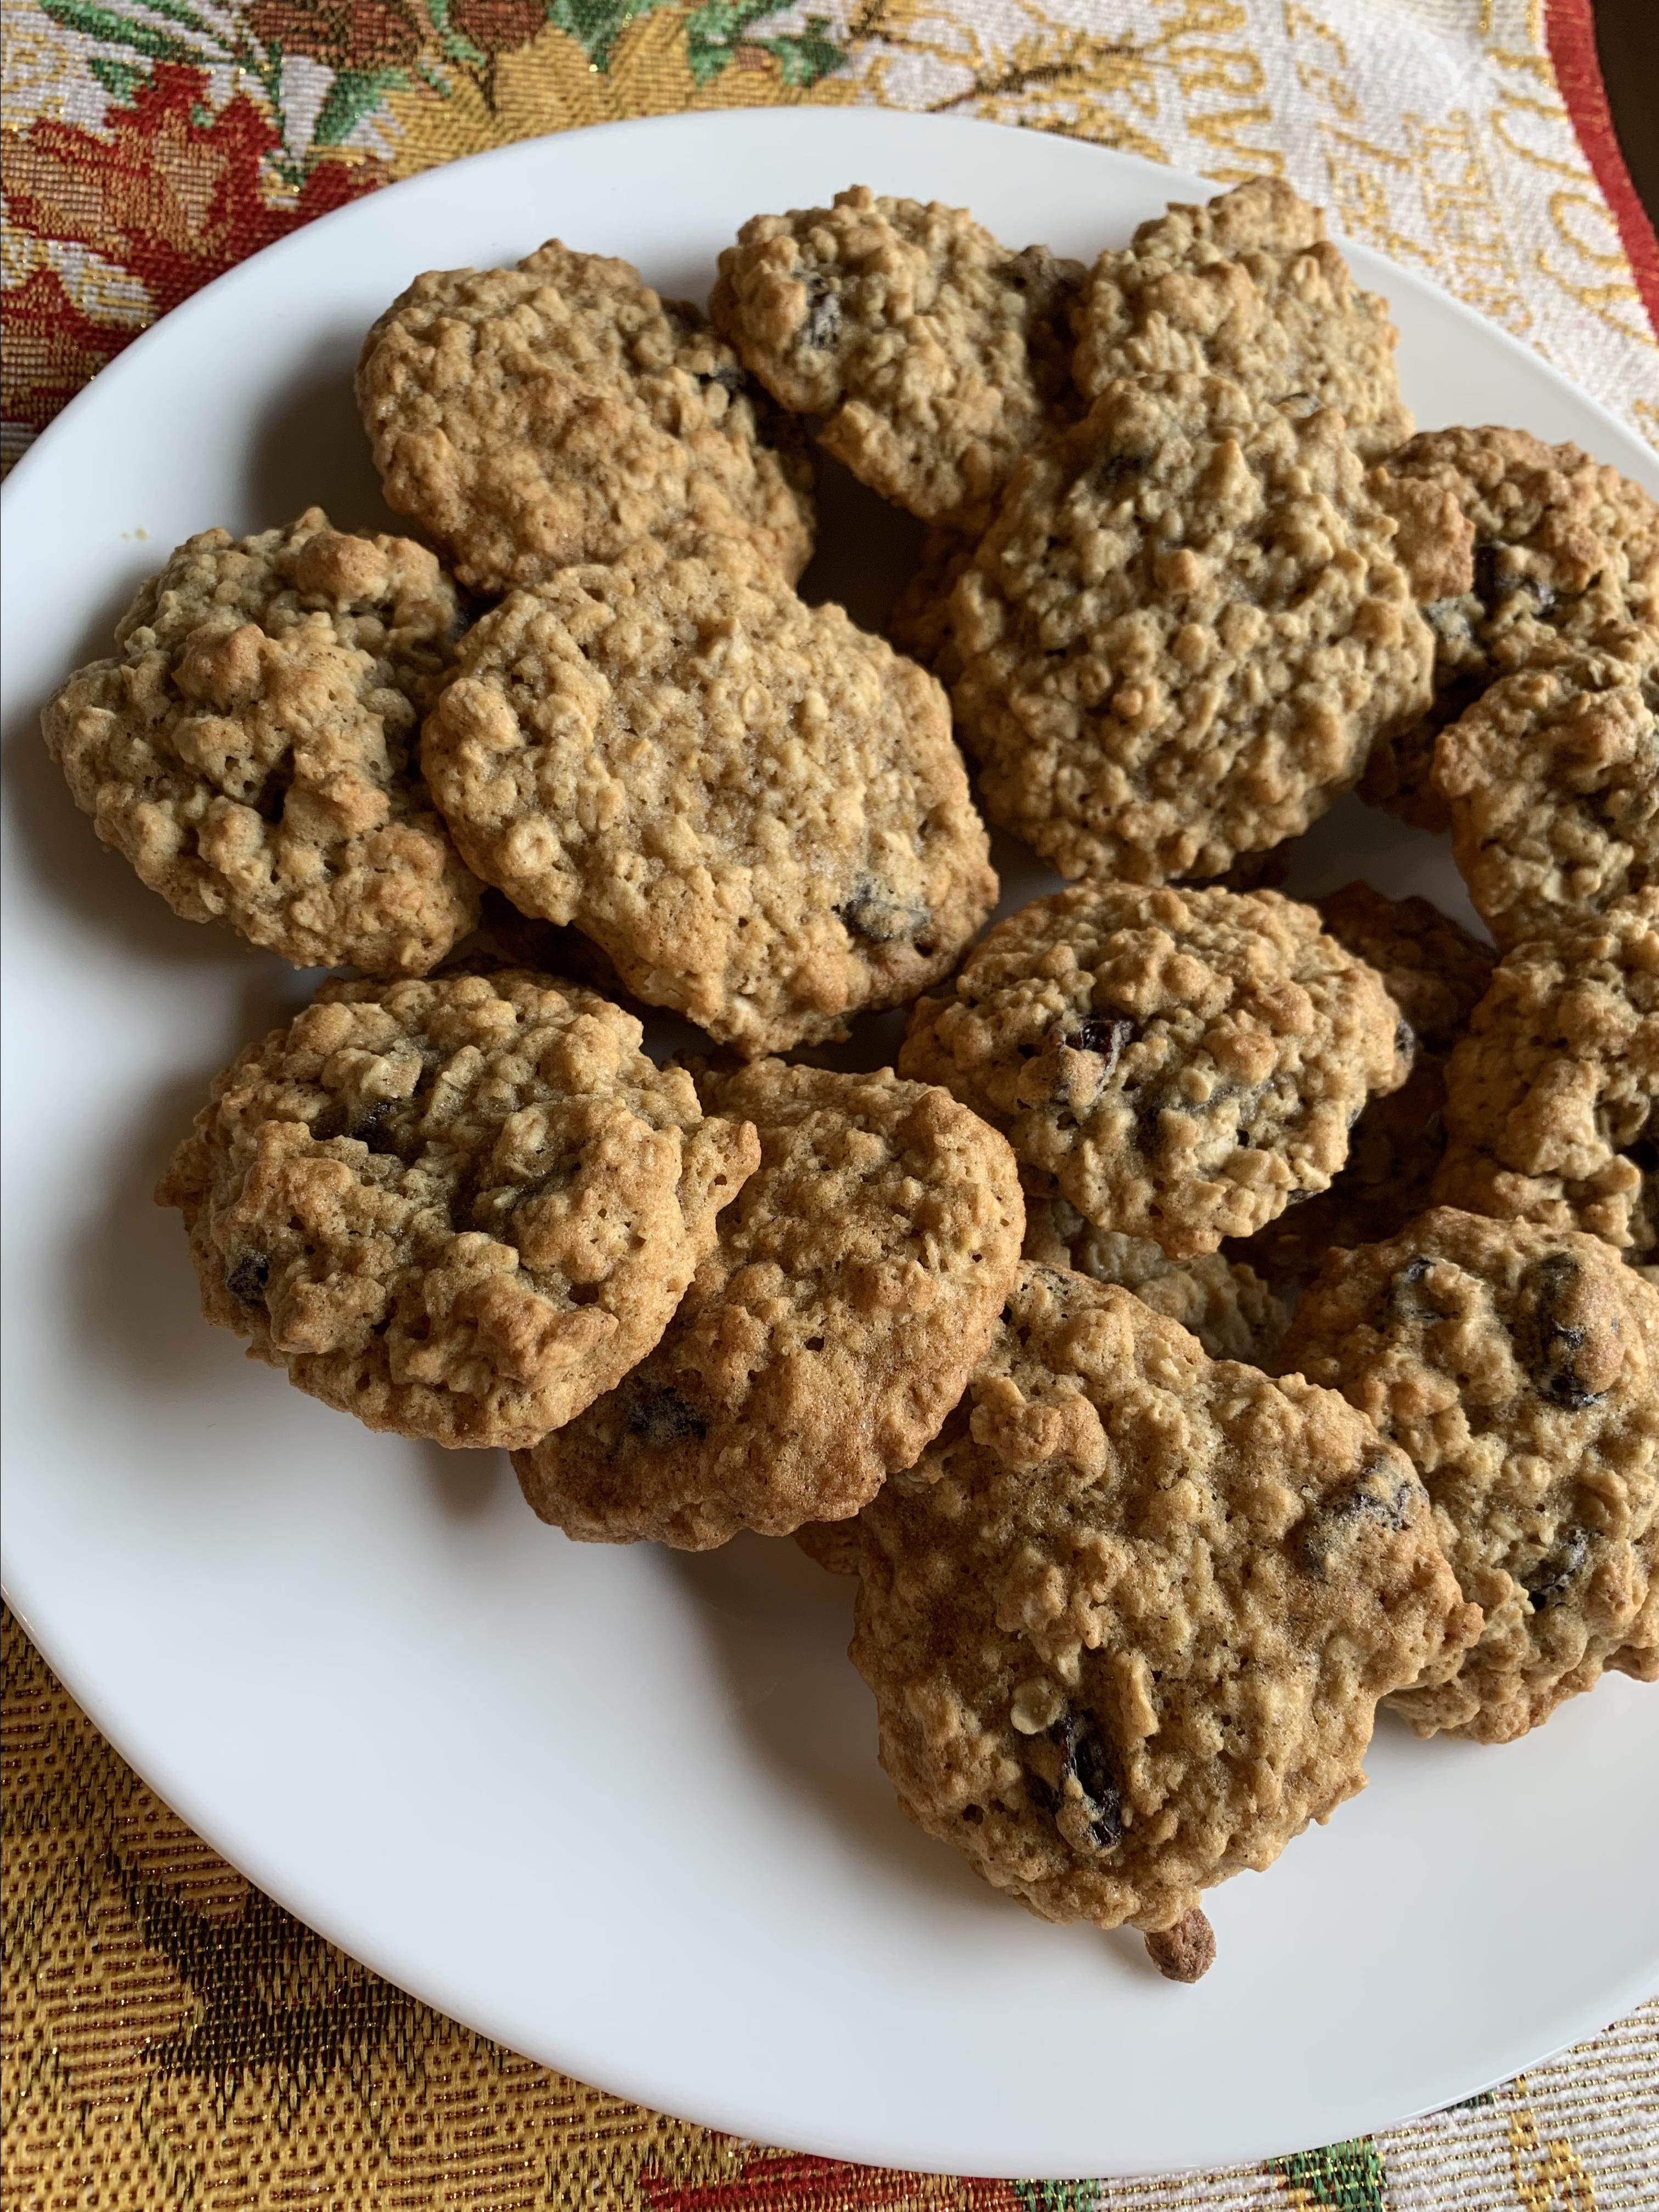 Oatmeal Raisin Cookies I Kimberly Potter